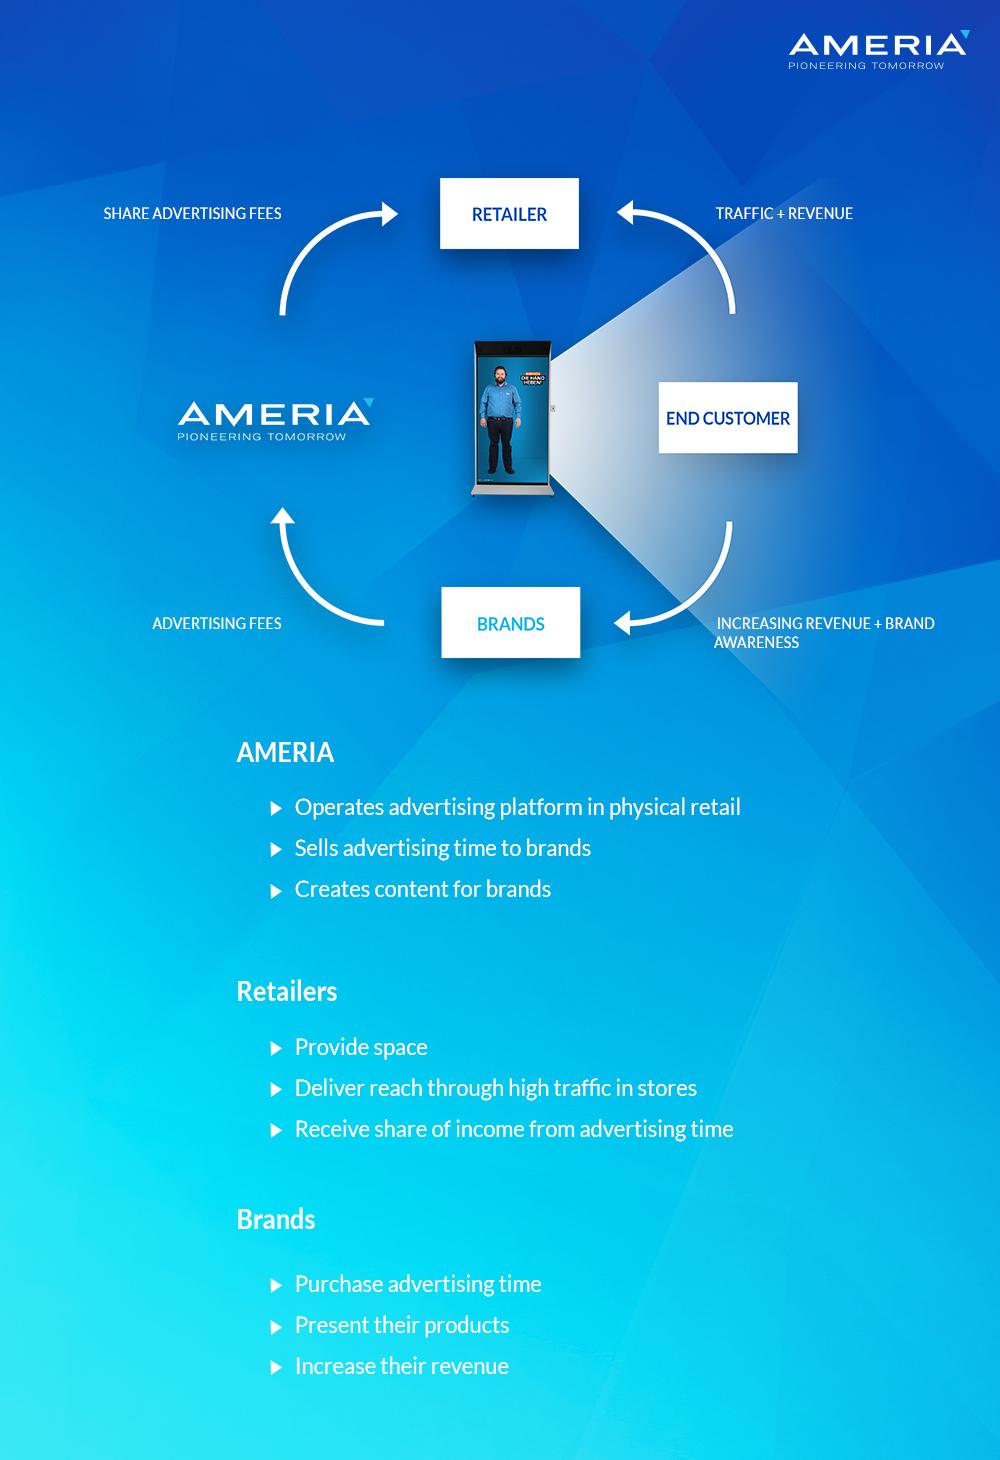 AMERIA - business model platform